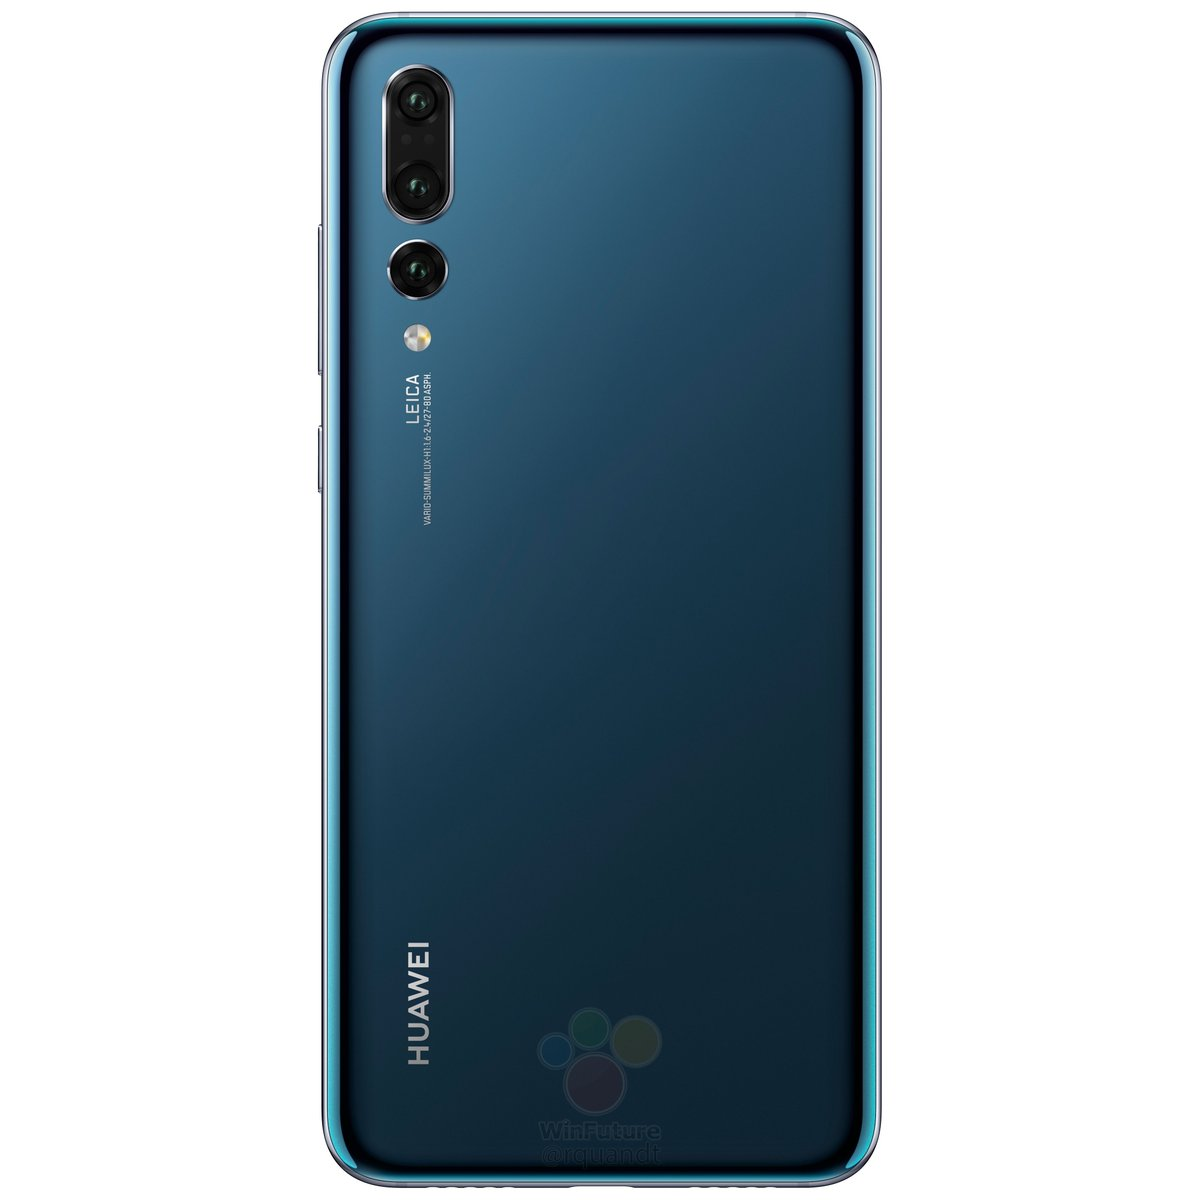 Huawei-P20-Pro-12